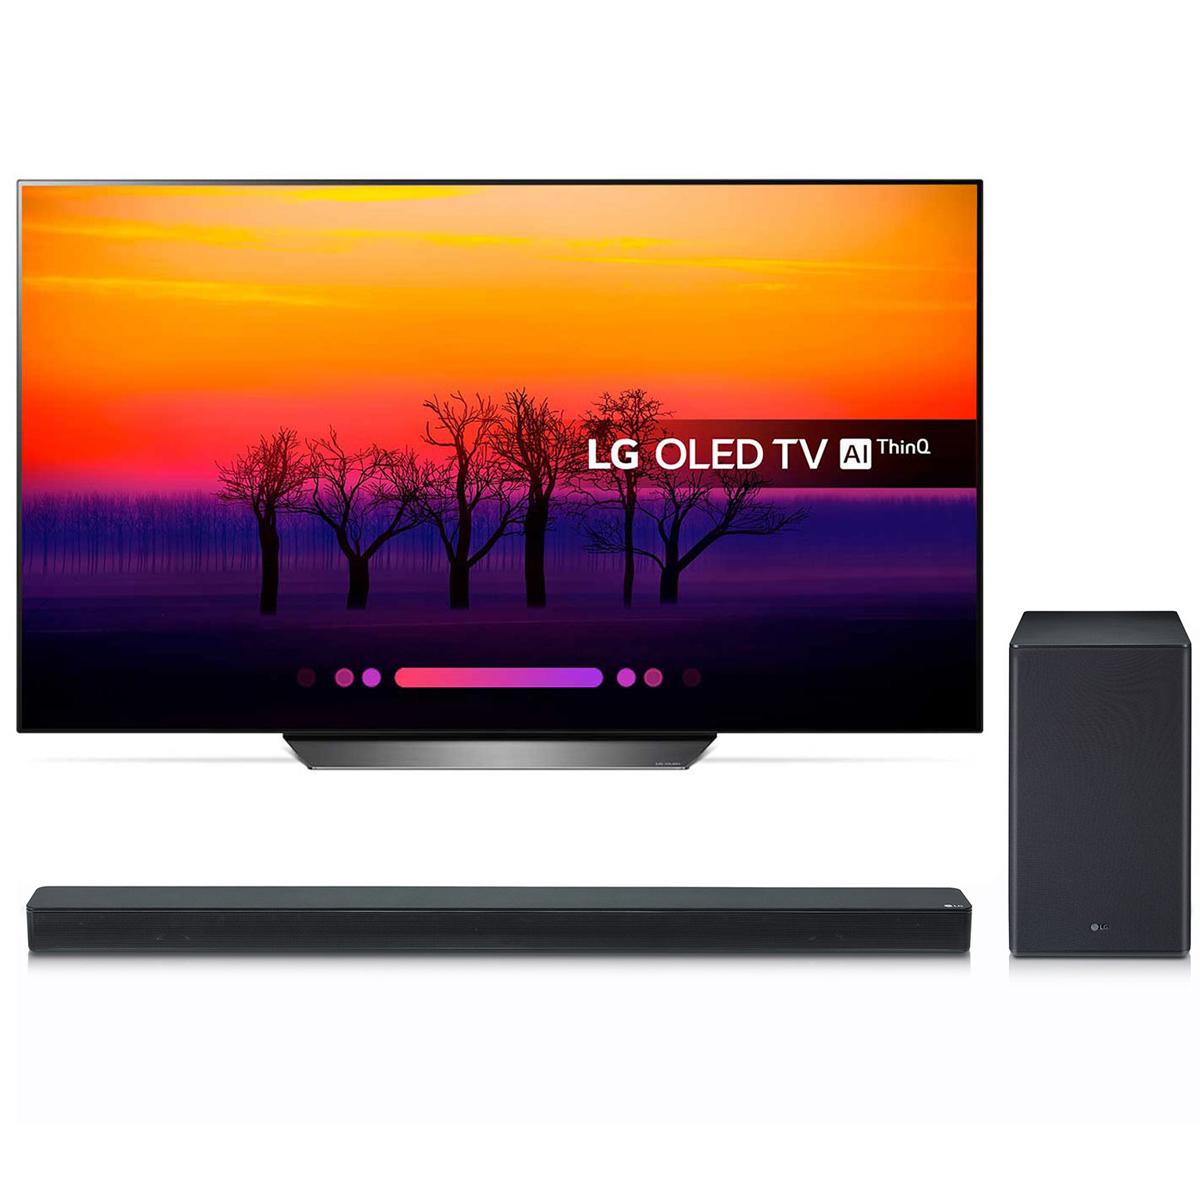 "TV LG OLED65B8 + SK8 Téléviseur OLED 4K 65"" (165 cm) 16/9 - 3840 x 2160 pixels - Ultra HD 2160p - HDR - Wi-Fi - Bluetooth - Dolby Atmos + Barre de son 2.1 360 Watts"